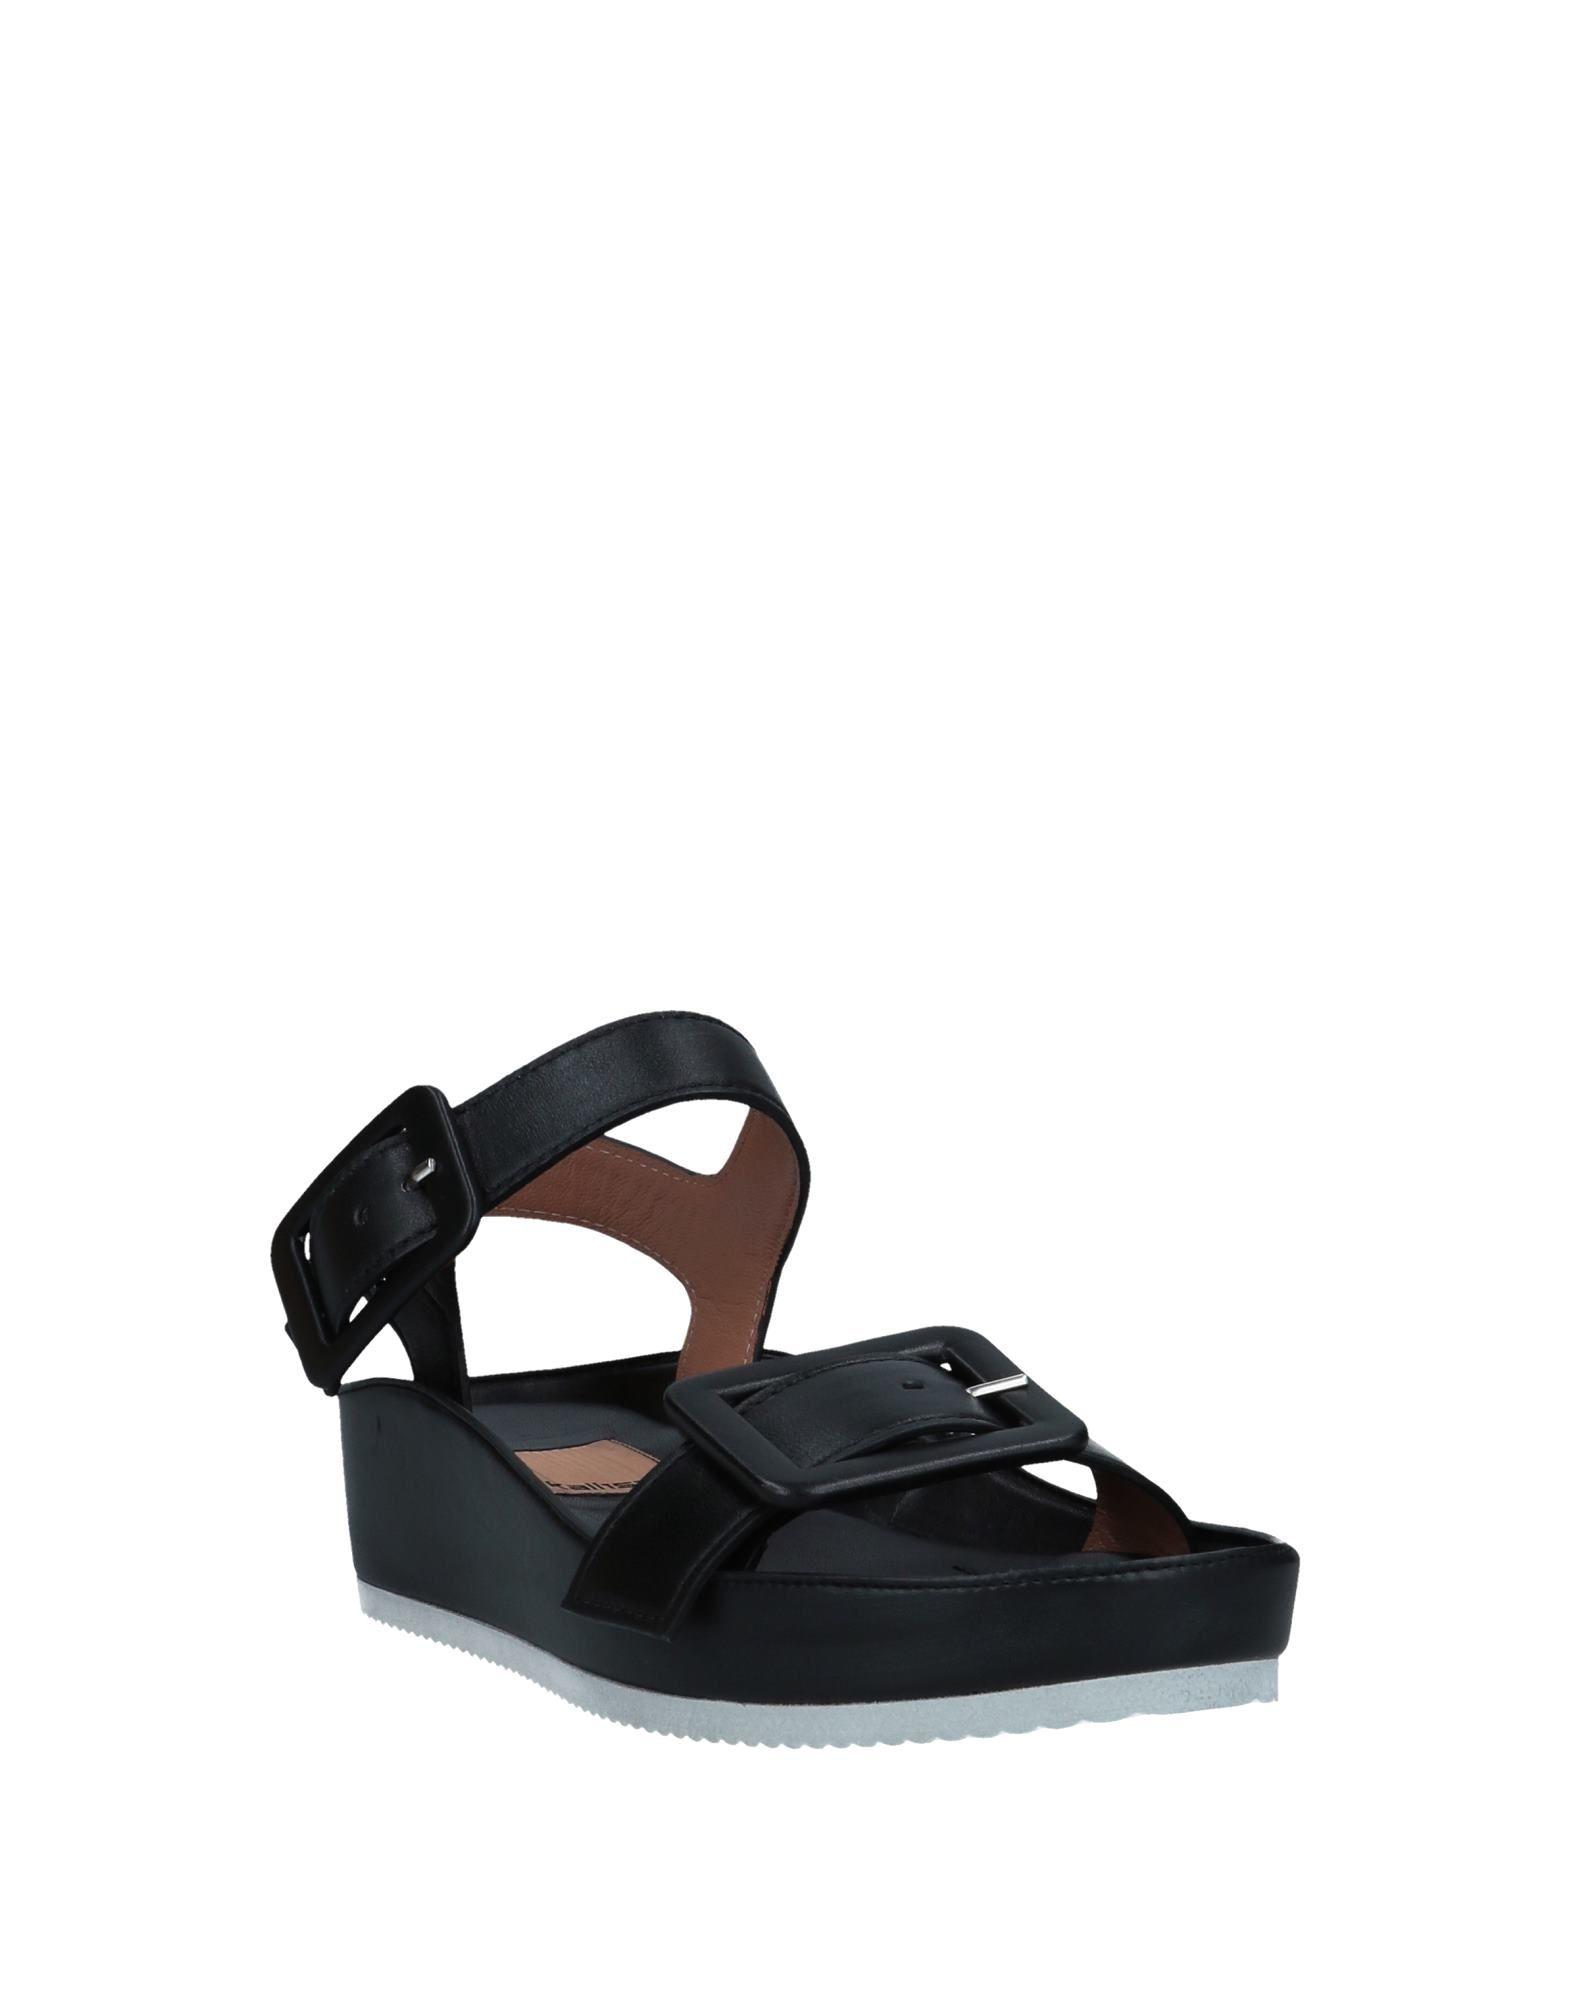 Kallistè Sandalen strapazierfähige Damen  11204647UEGut aussehende strapazierfähige Sandalen Schuhe 8e70b9